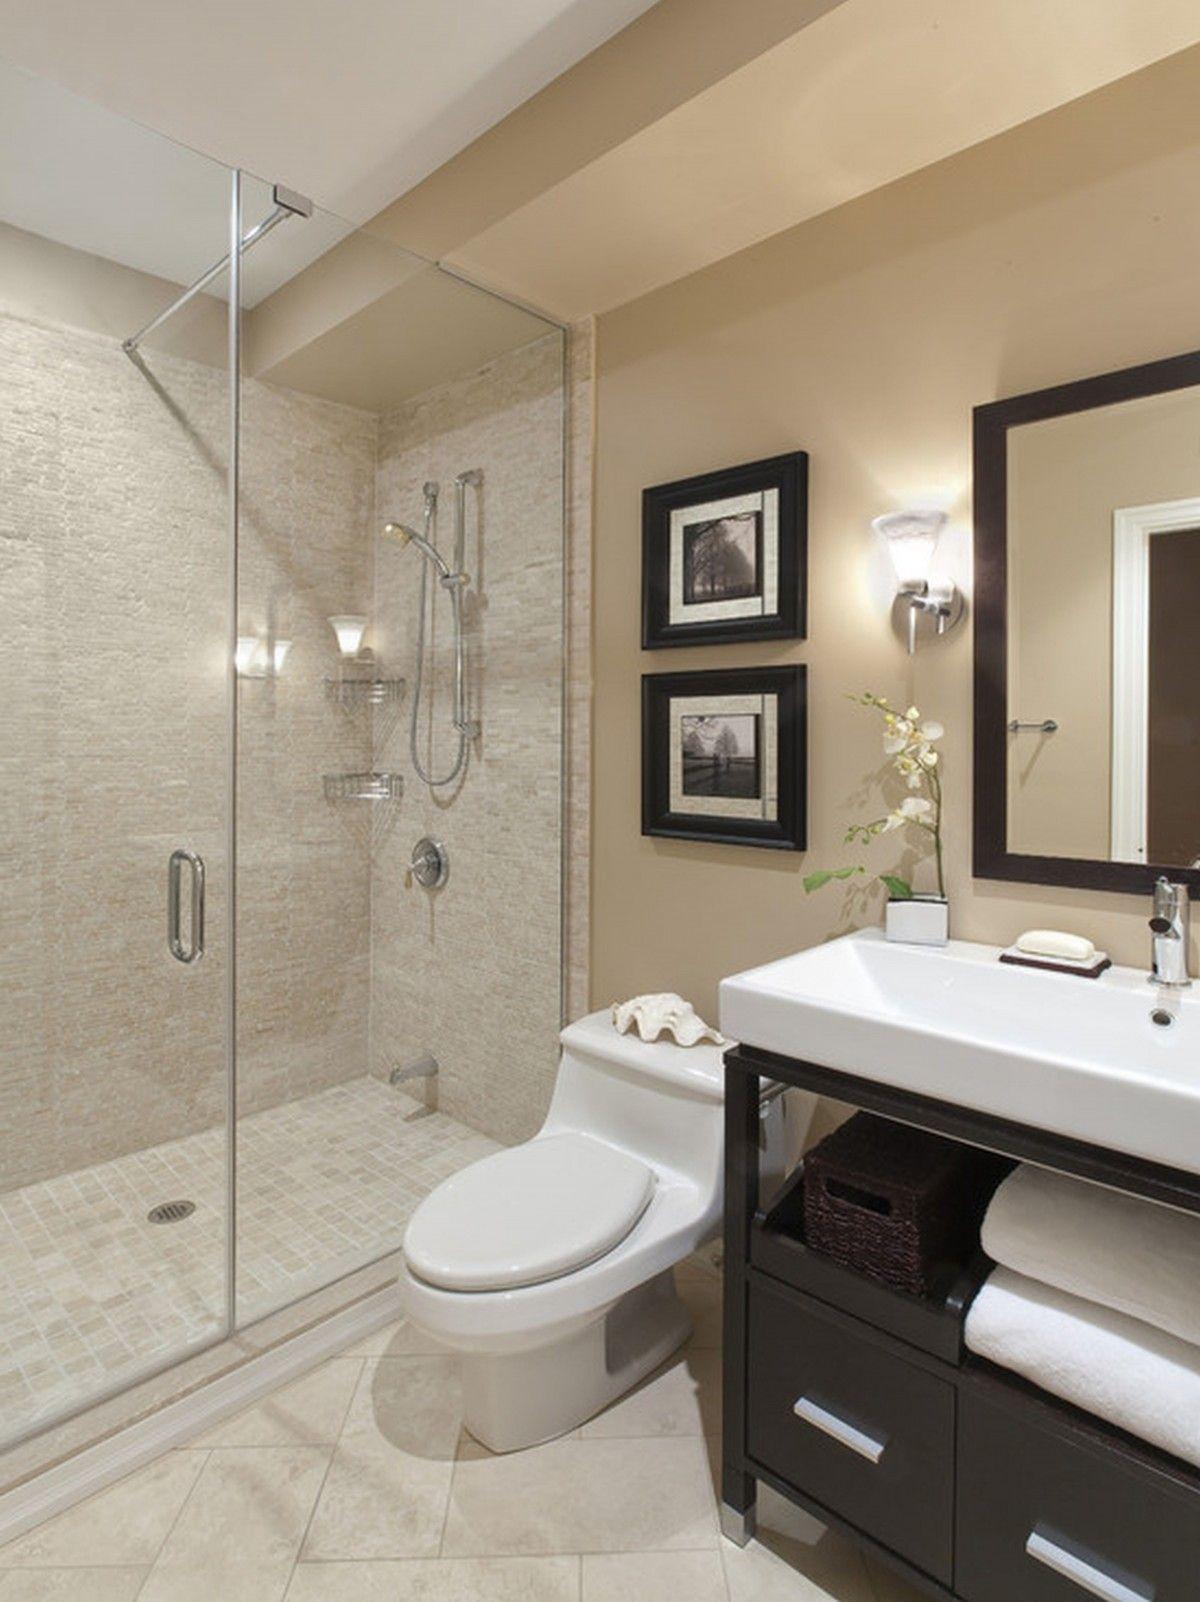 Bathrooms Designs Pictures | En Suite Bathrooms Designs Google Search Home Pinterest Banos